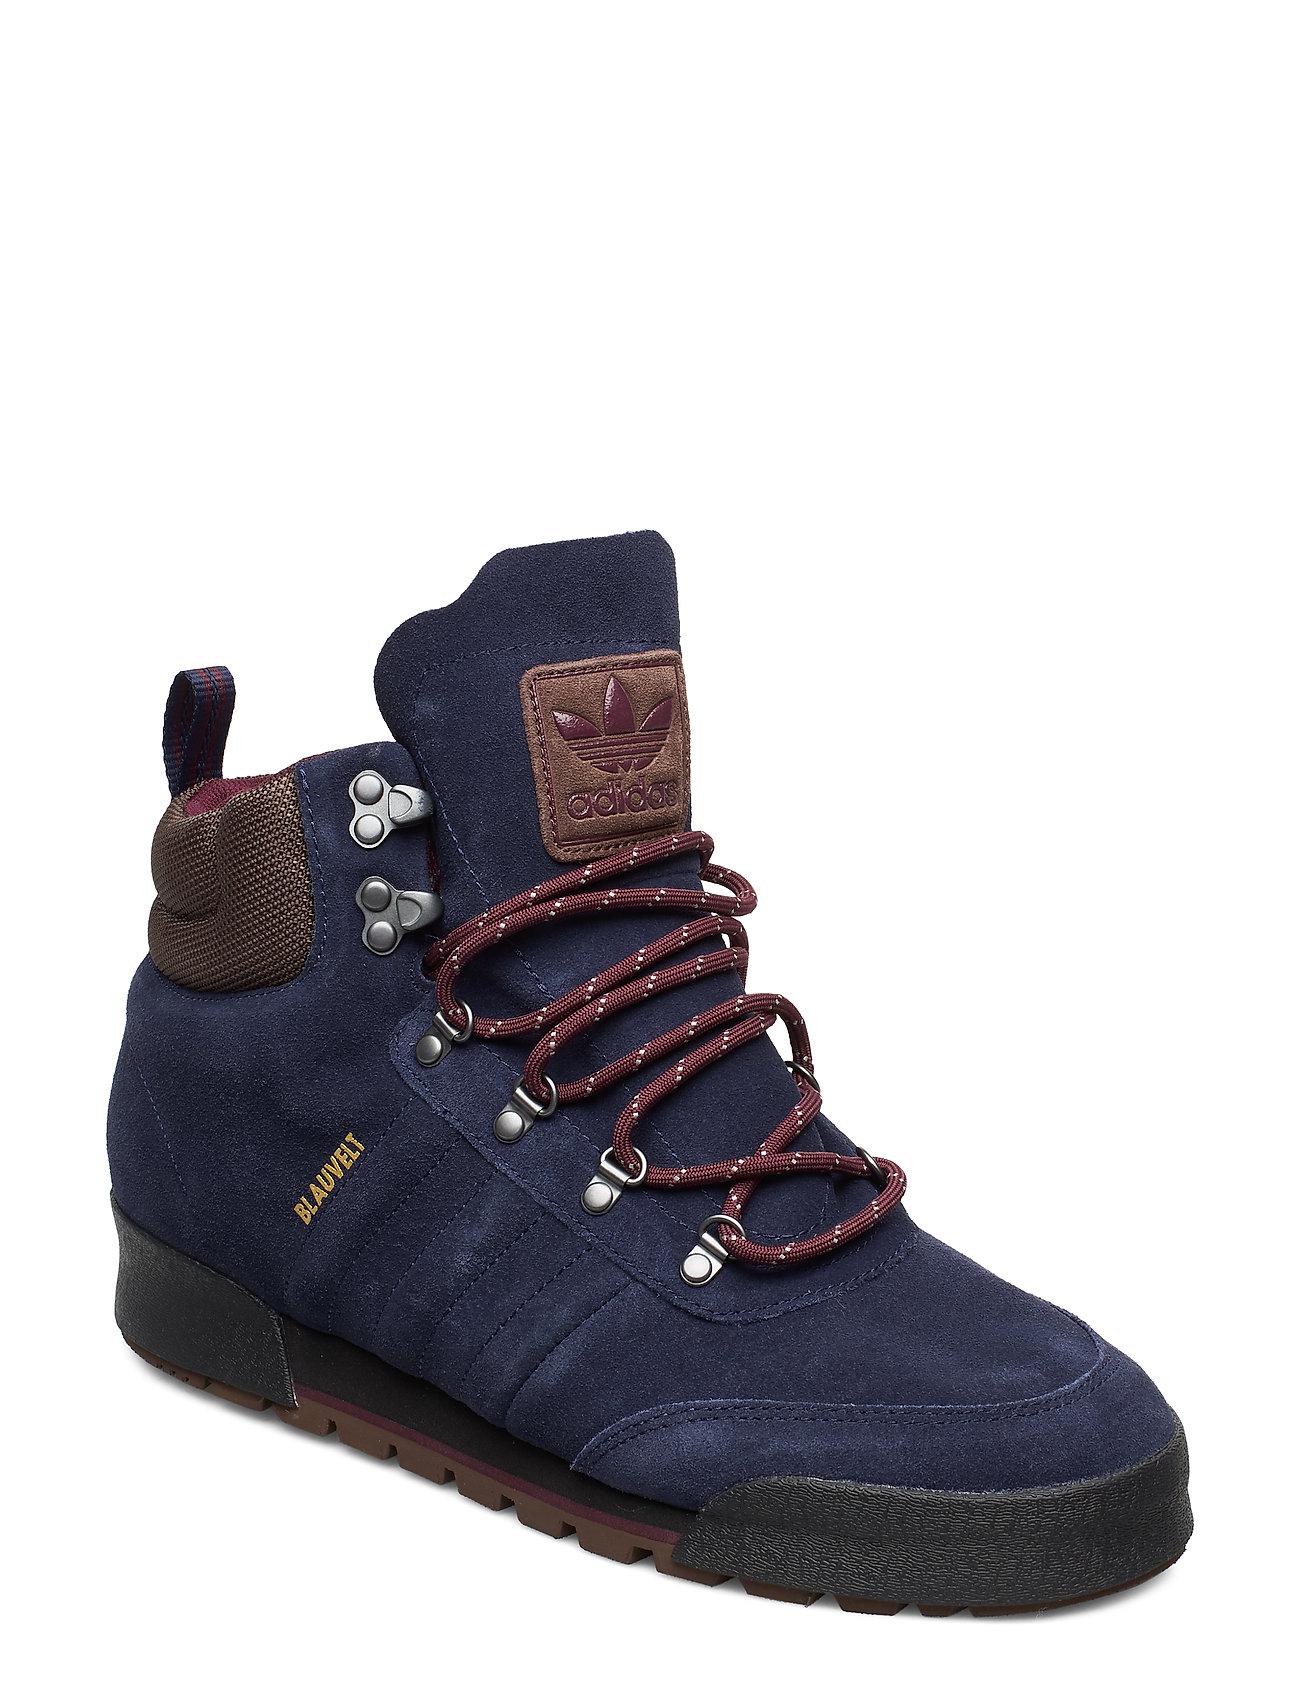 adidas winter boots Heren Schoenen | KLEDING.nl | Vergelijk